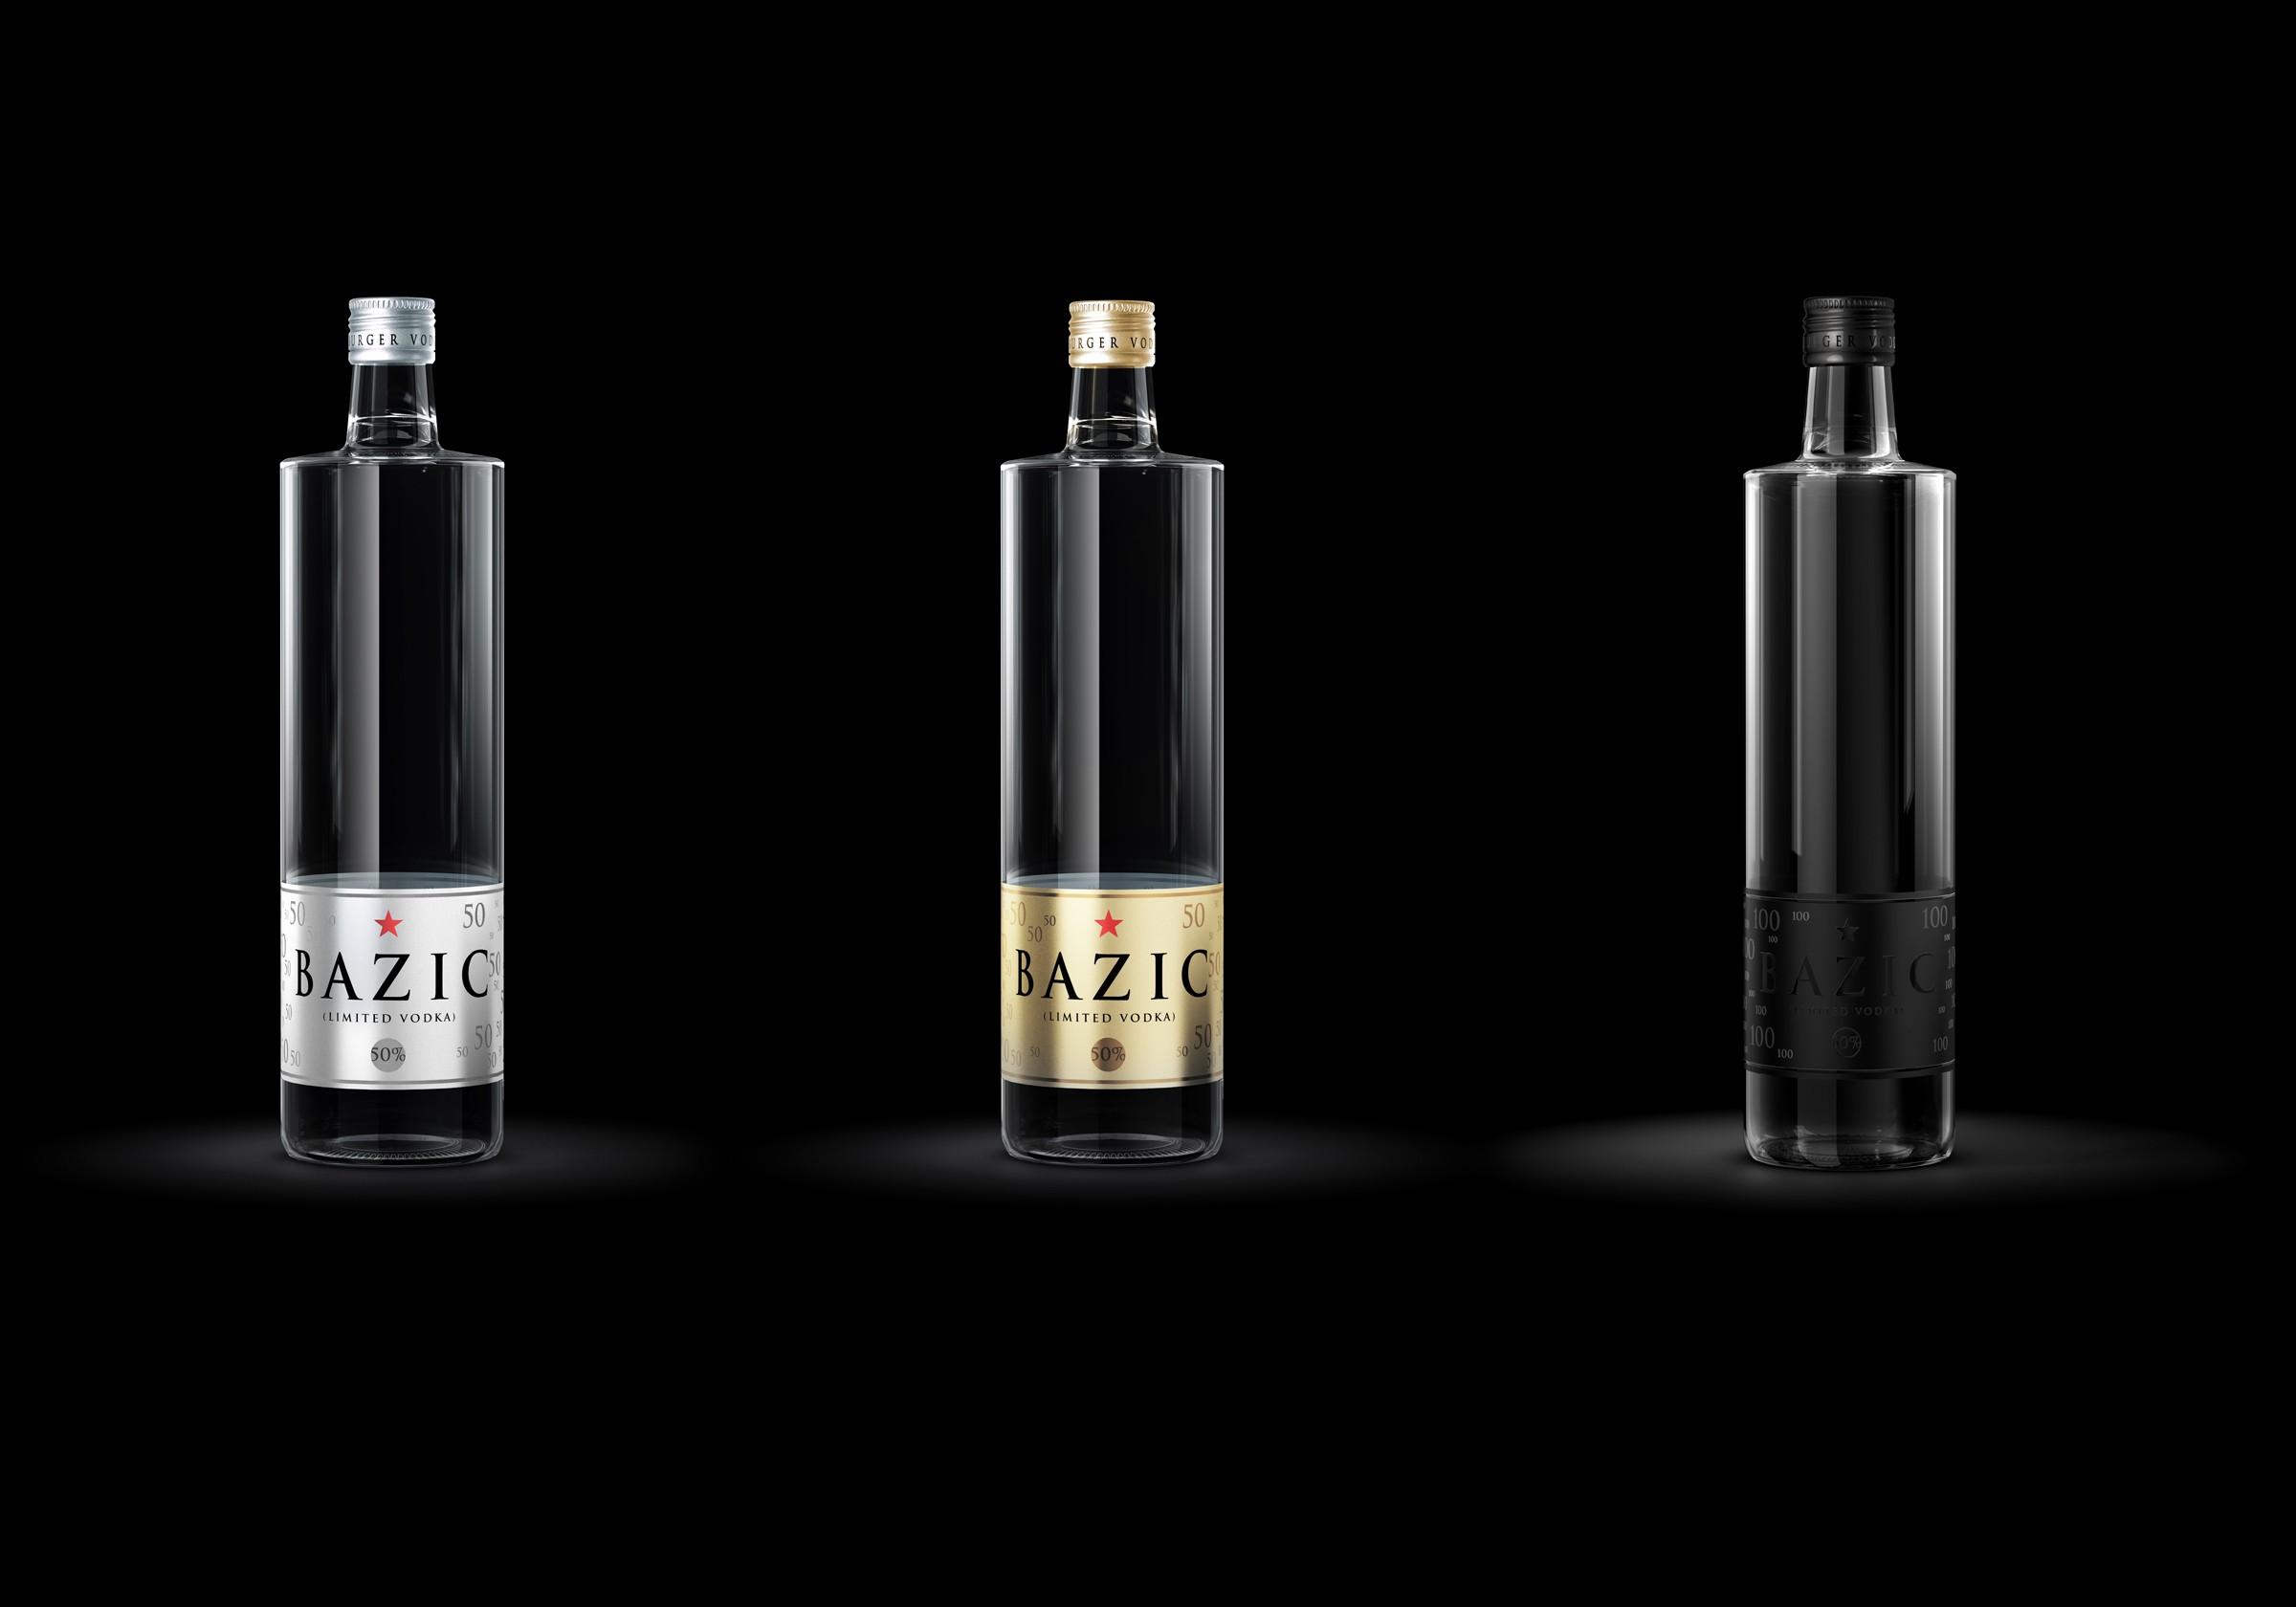 Bazic Product 1 1 - Bazic Vodka